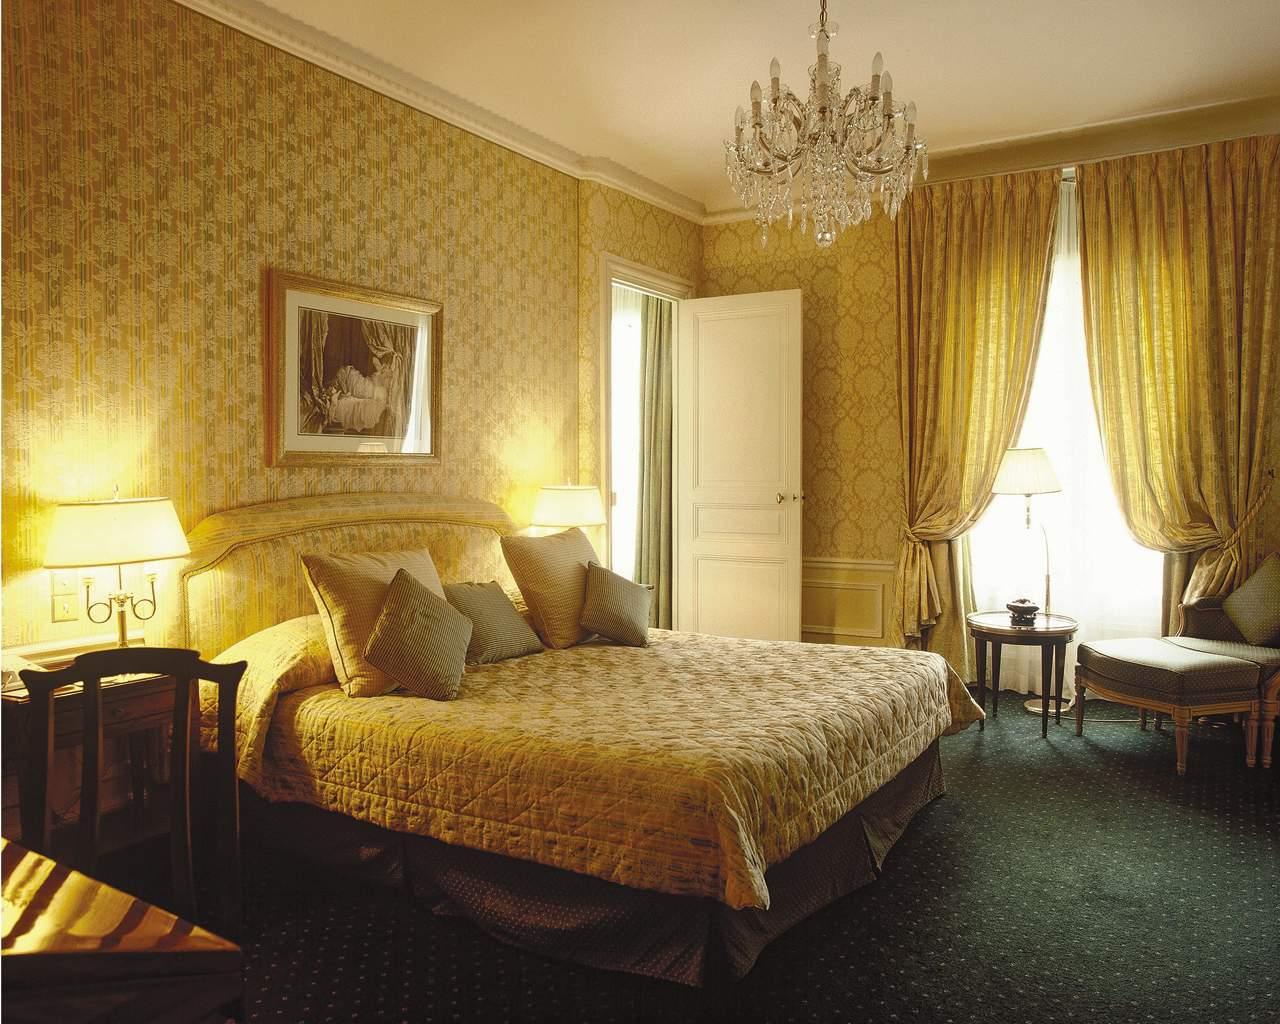 http://4.bp.blogspot.com/-Ivl4EqJ6B1s/To5tk2R_GDI/AAAAAAAABDY/JfQ_Px3kzjk/s1600/wall+Best-Luxury-Bed-Room-Design-Interior-Ideas-with-Wallpapers41.jpg